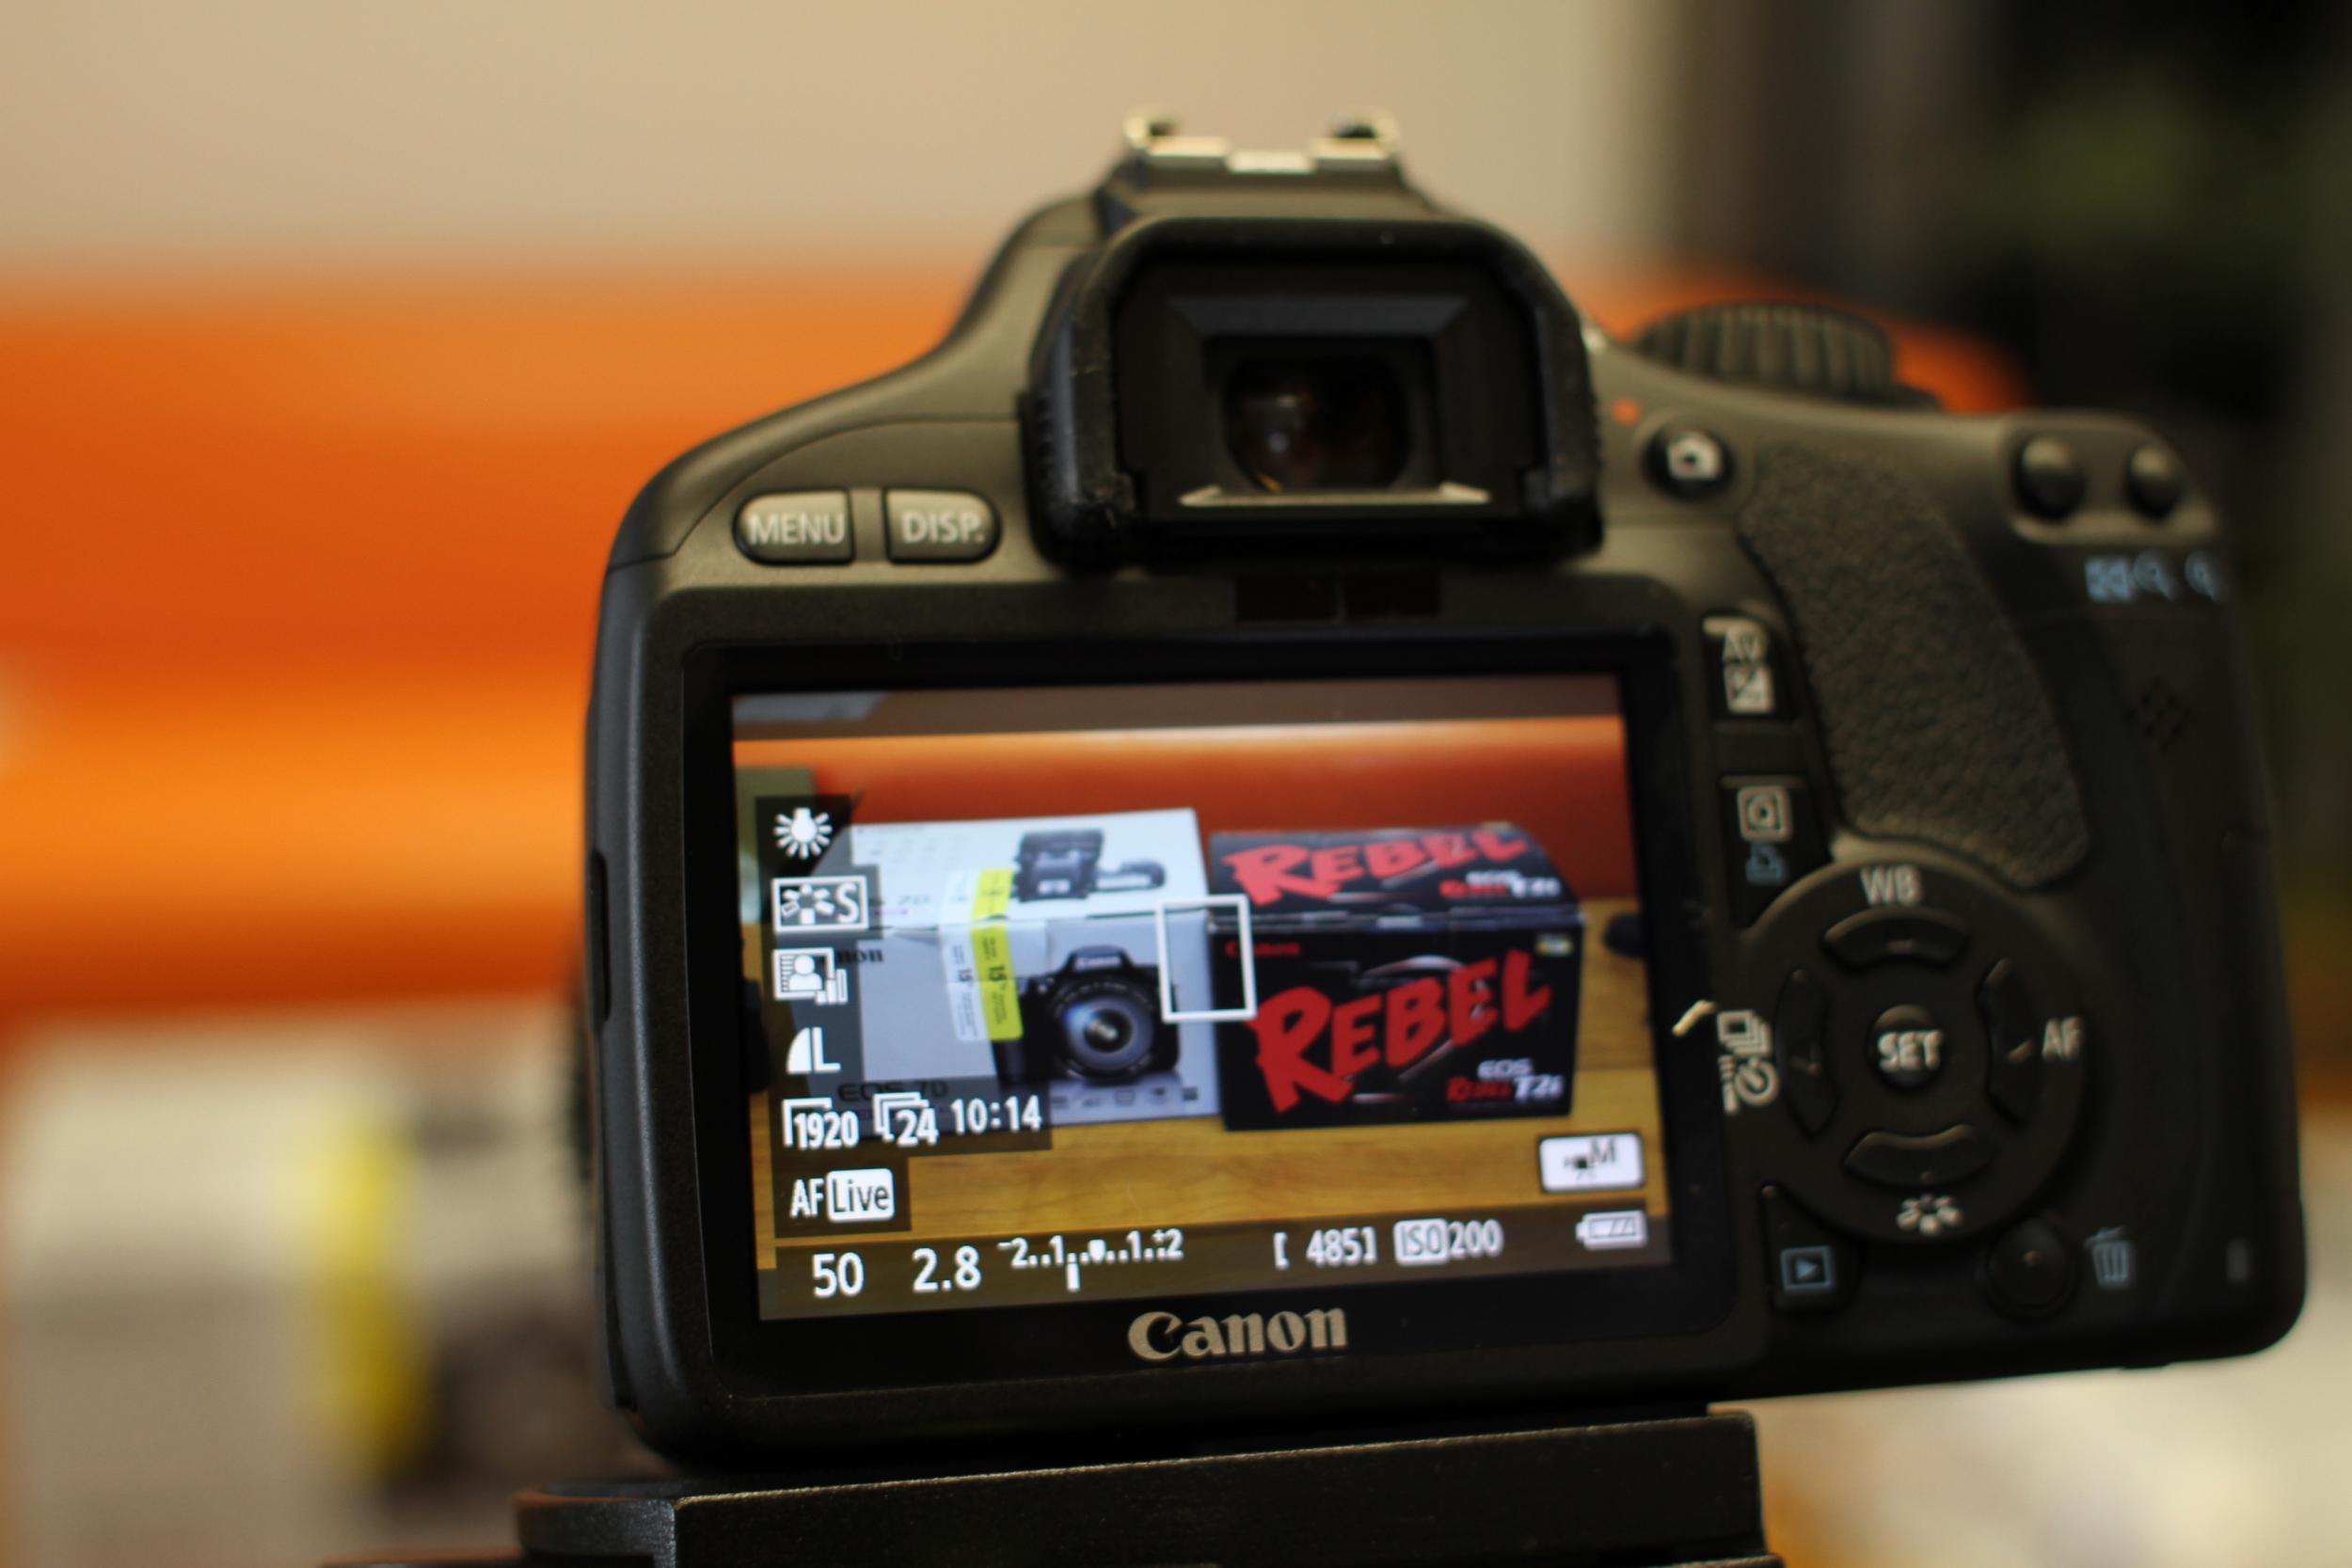 t2i manual video professional user manual ebooks u2022 rh gogradresumes com Canon T2i Accessories Canon 5D Mark II